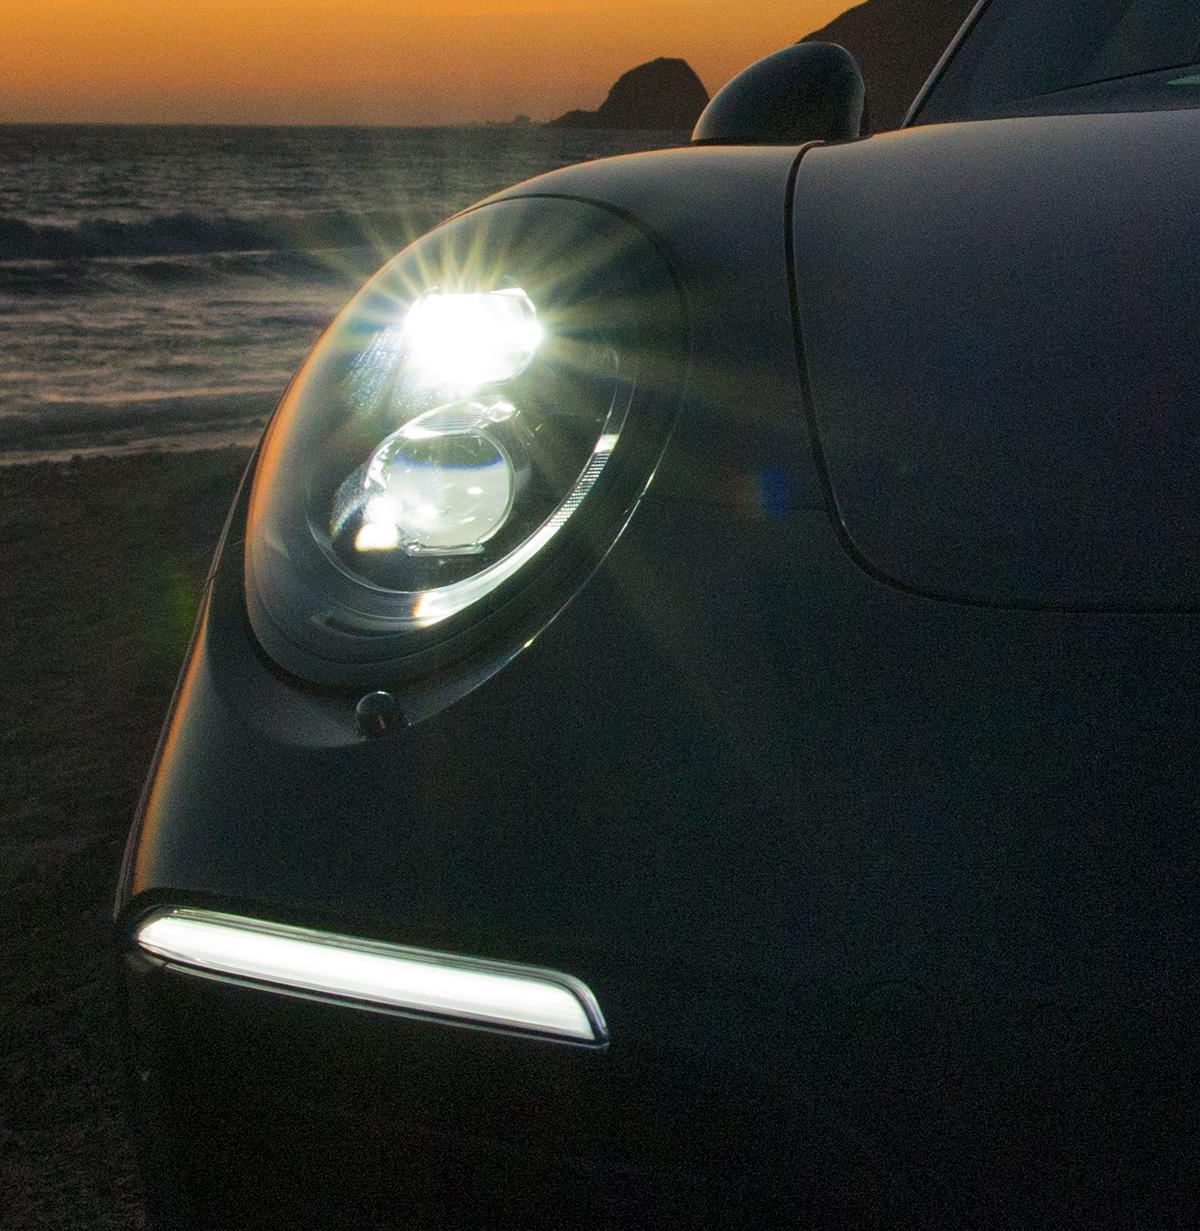 TrackWorthy - Porsche 911 C4S 991.2 - Canyon Roads - 04